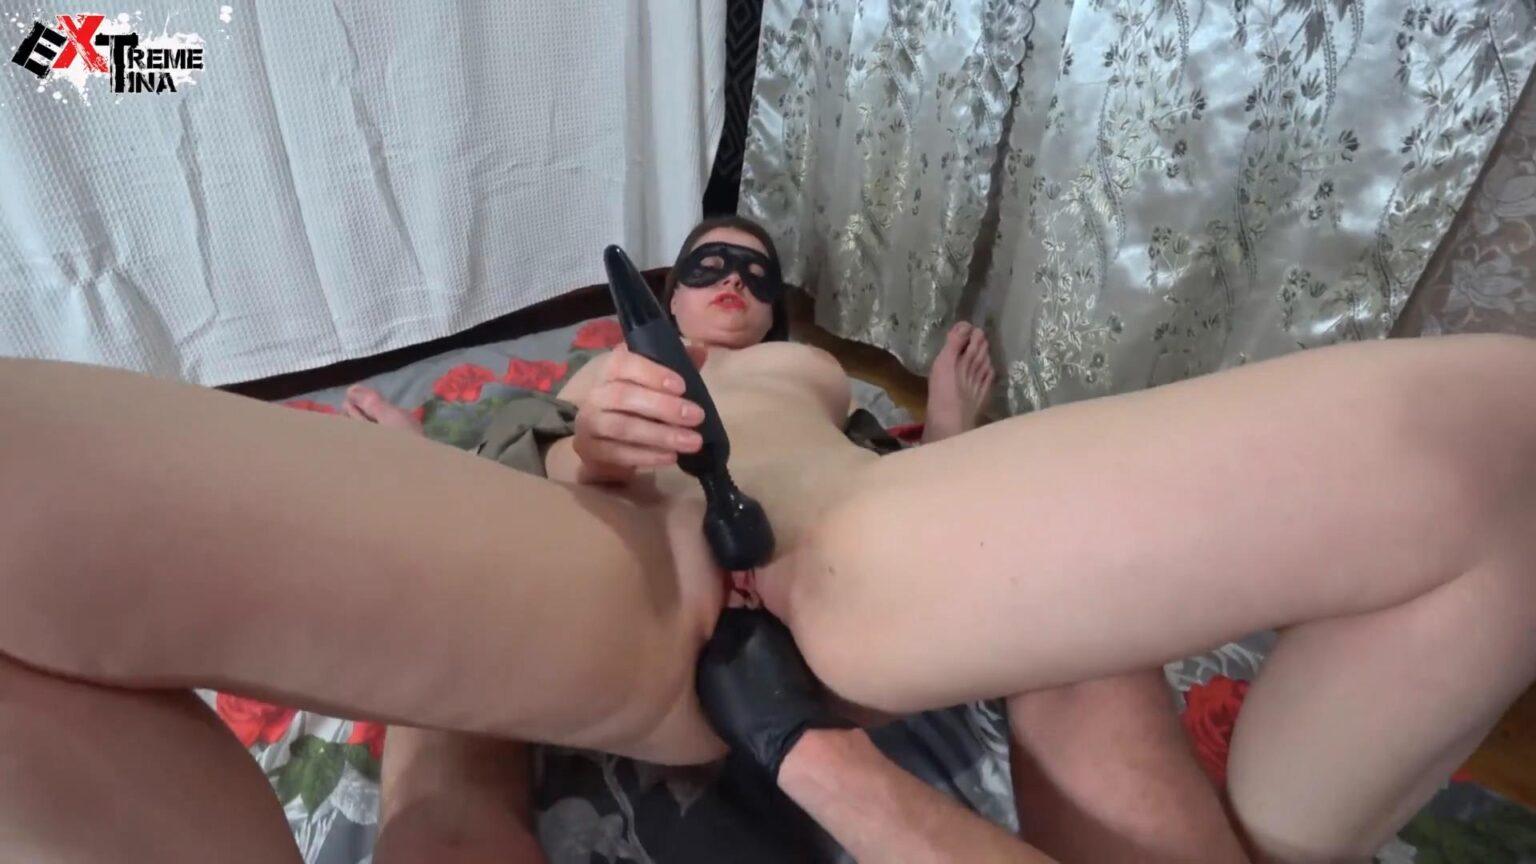 Hustler fuck buddy toy